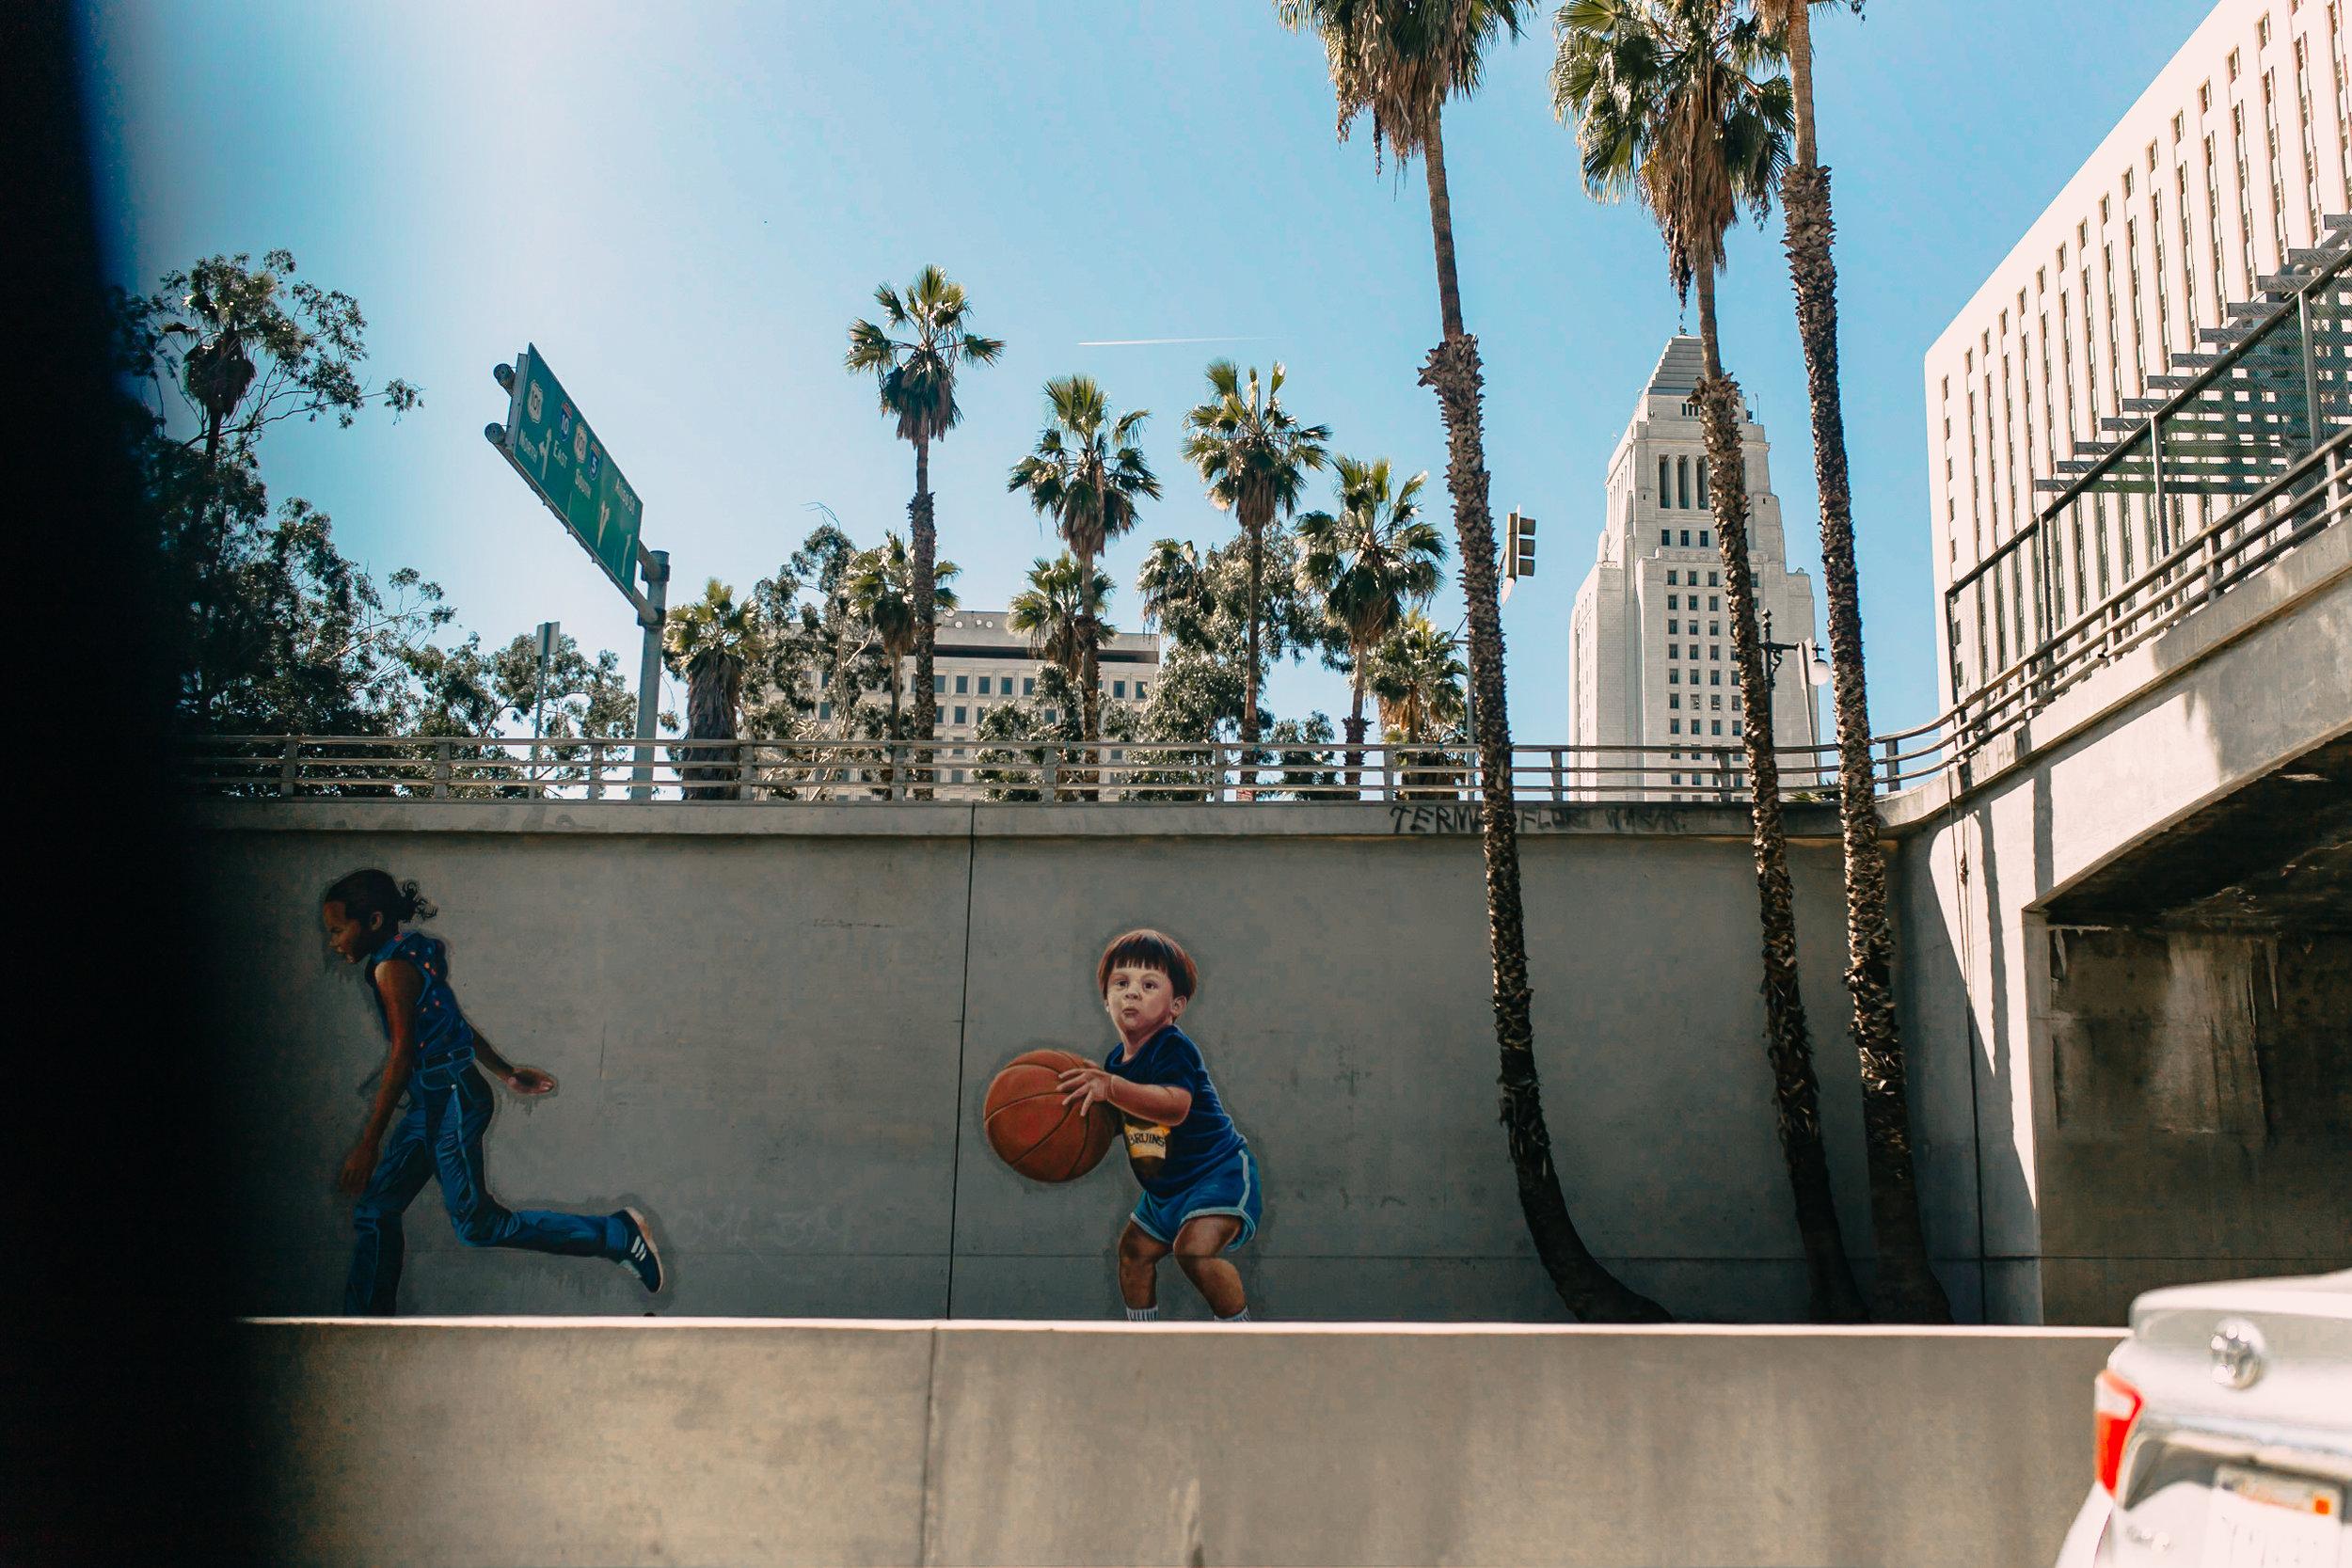 Las Angeles